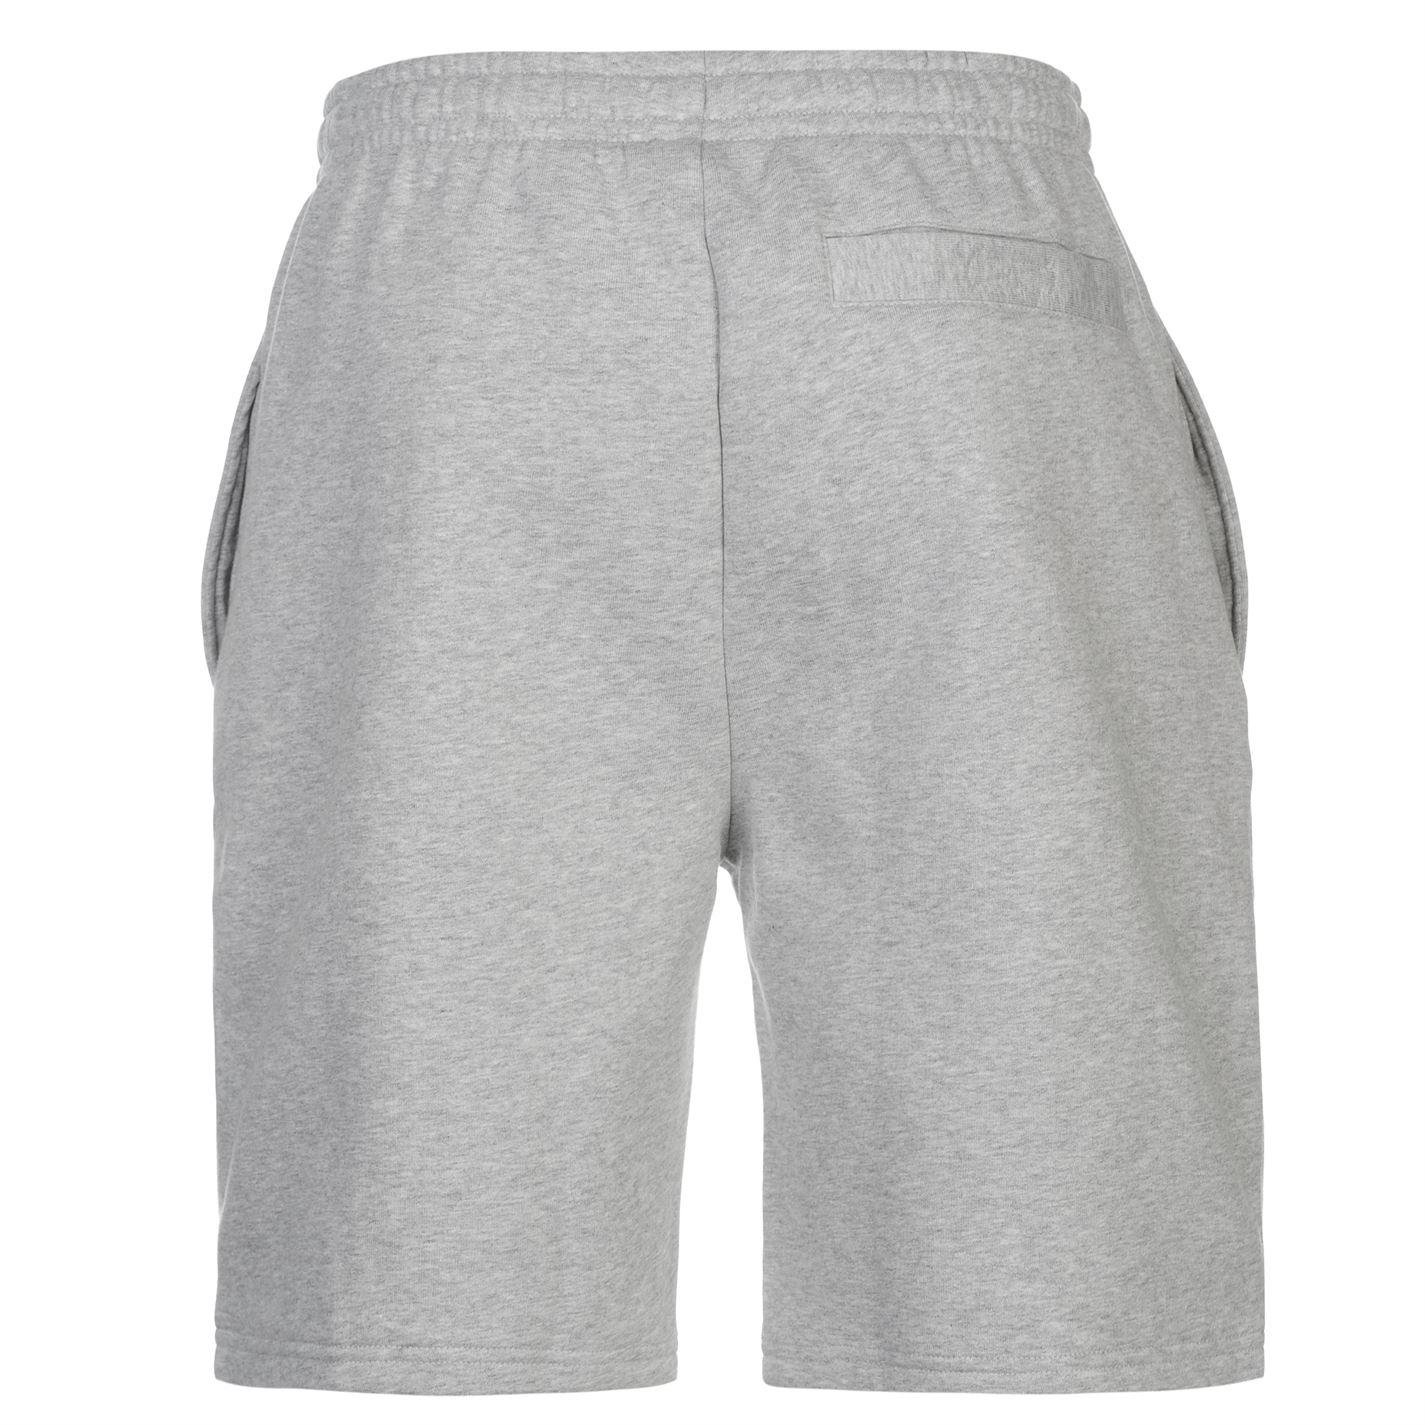 Lacoste-Fleece-Jogger-Shorts-Mens thumbnail 6